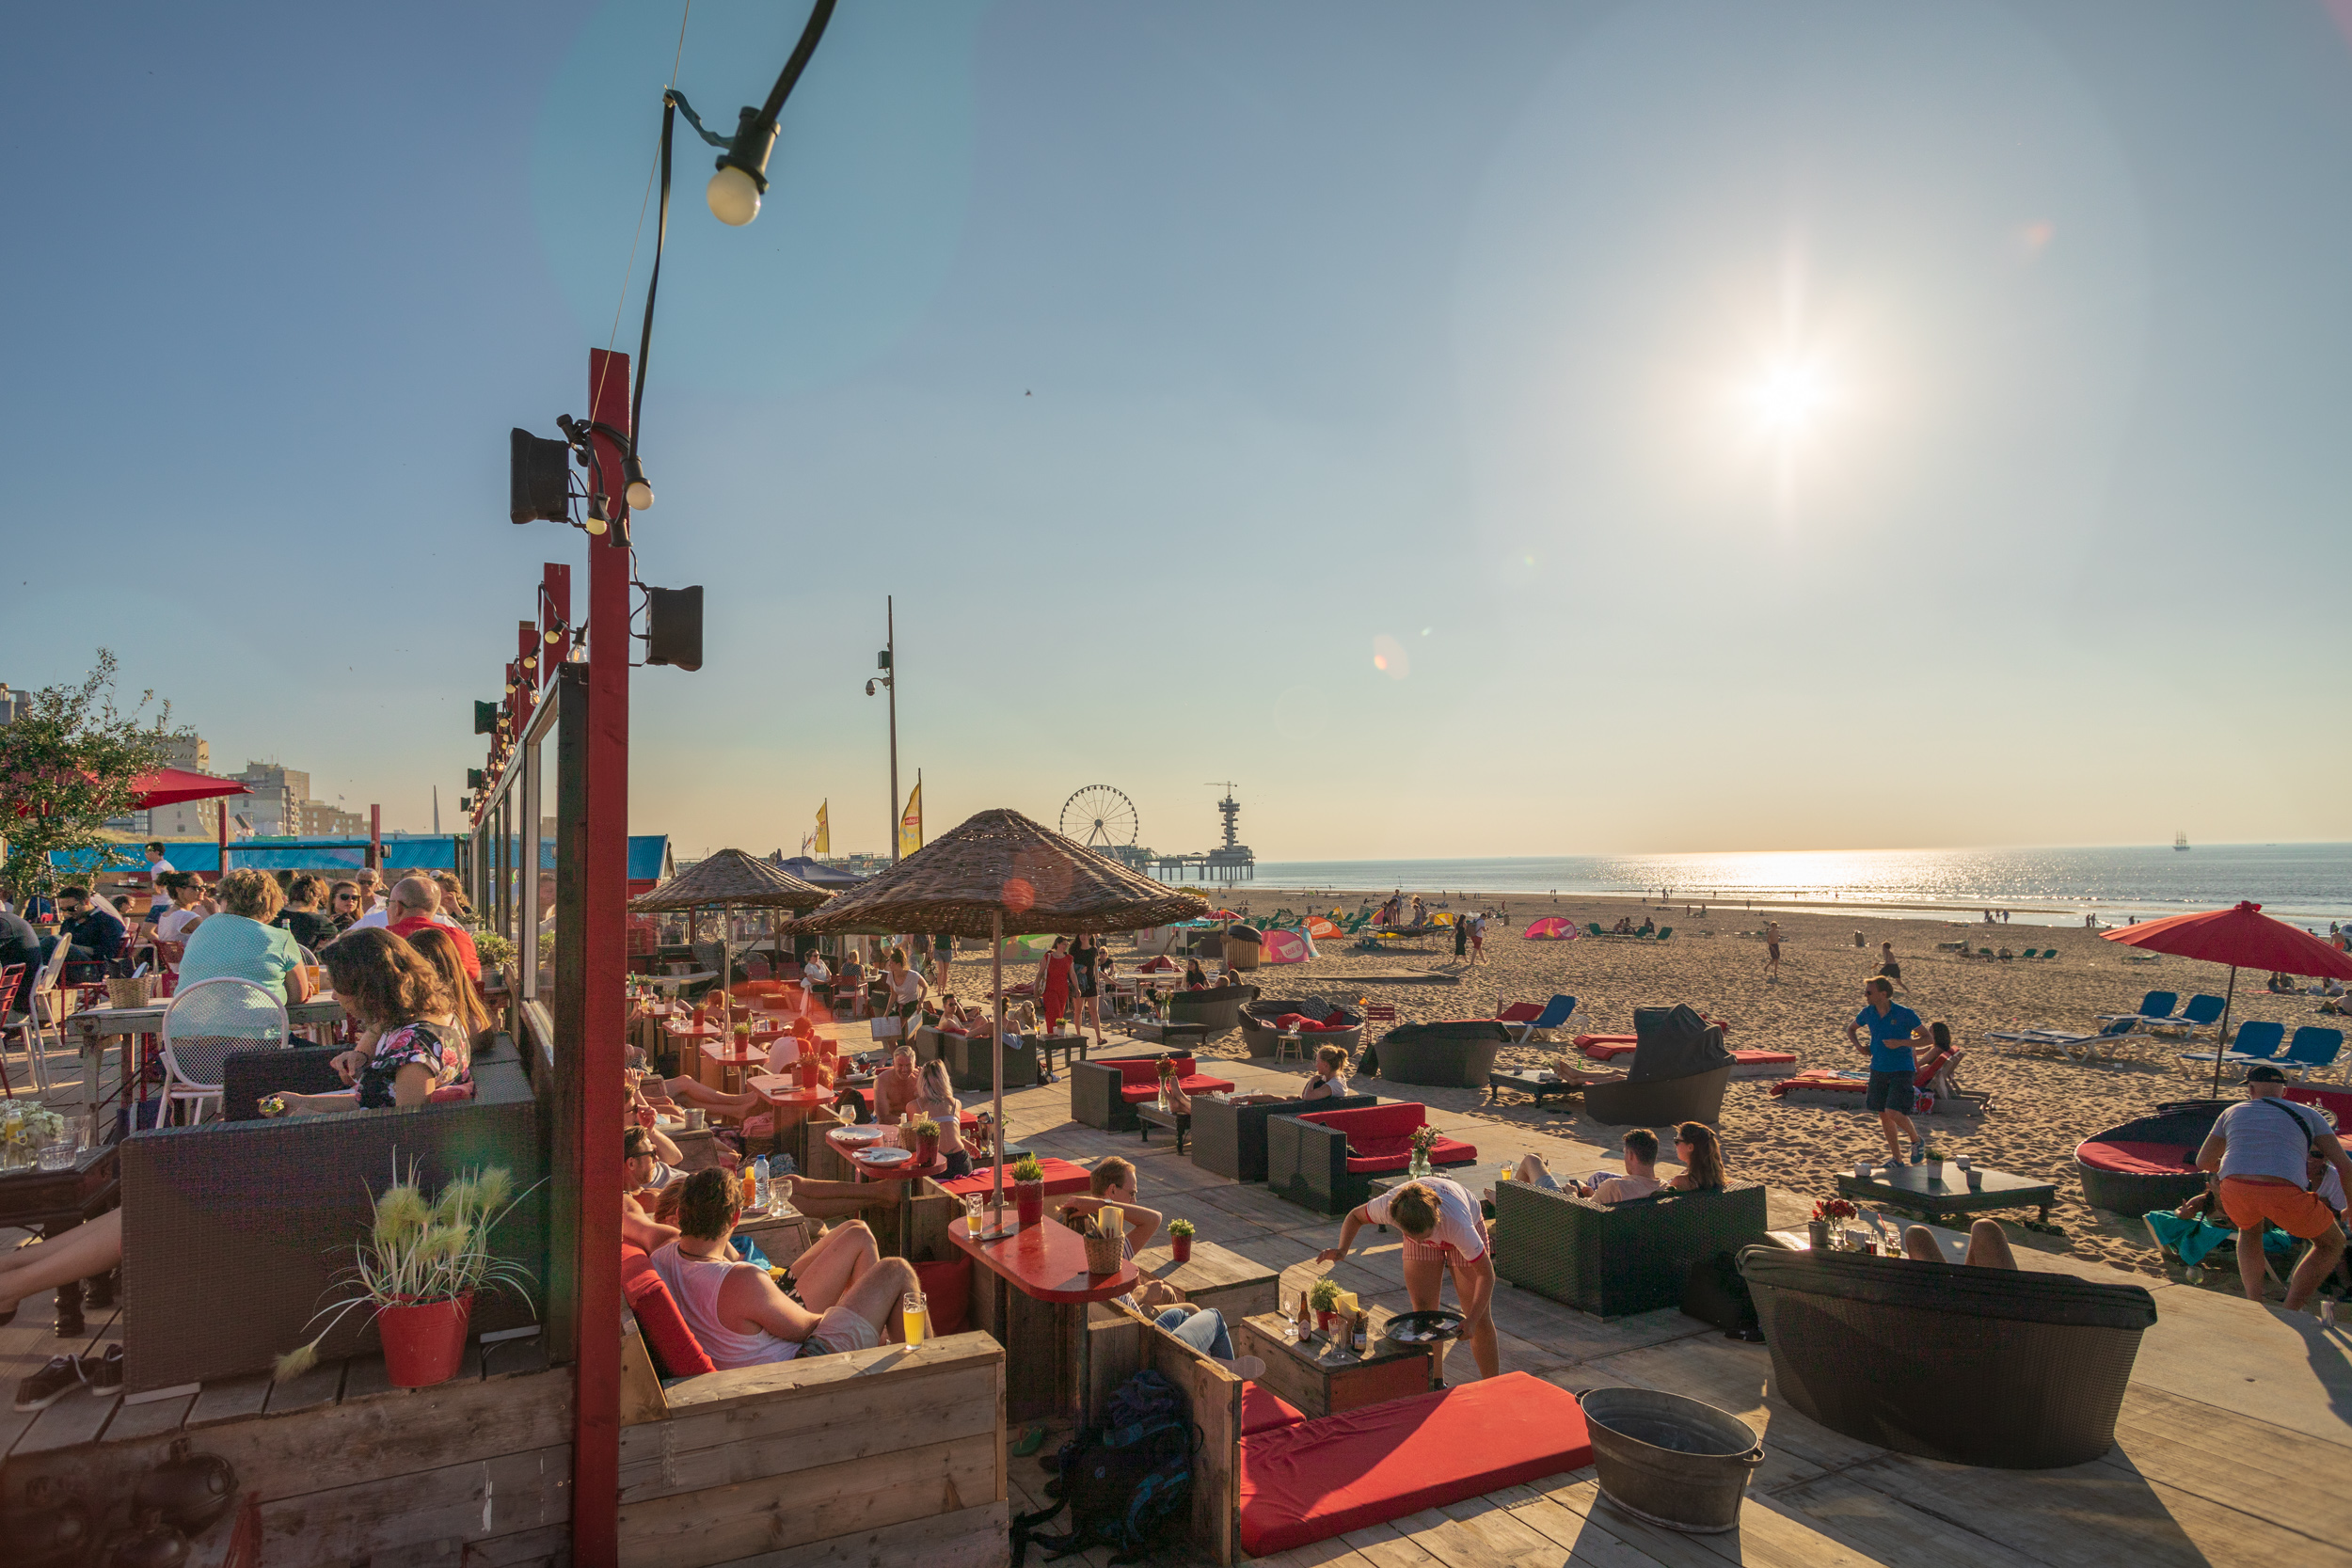 Beachclub Culpepper | Zwarte Pad Scheveningen-6-2.jpg